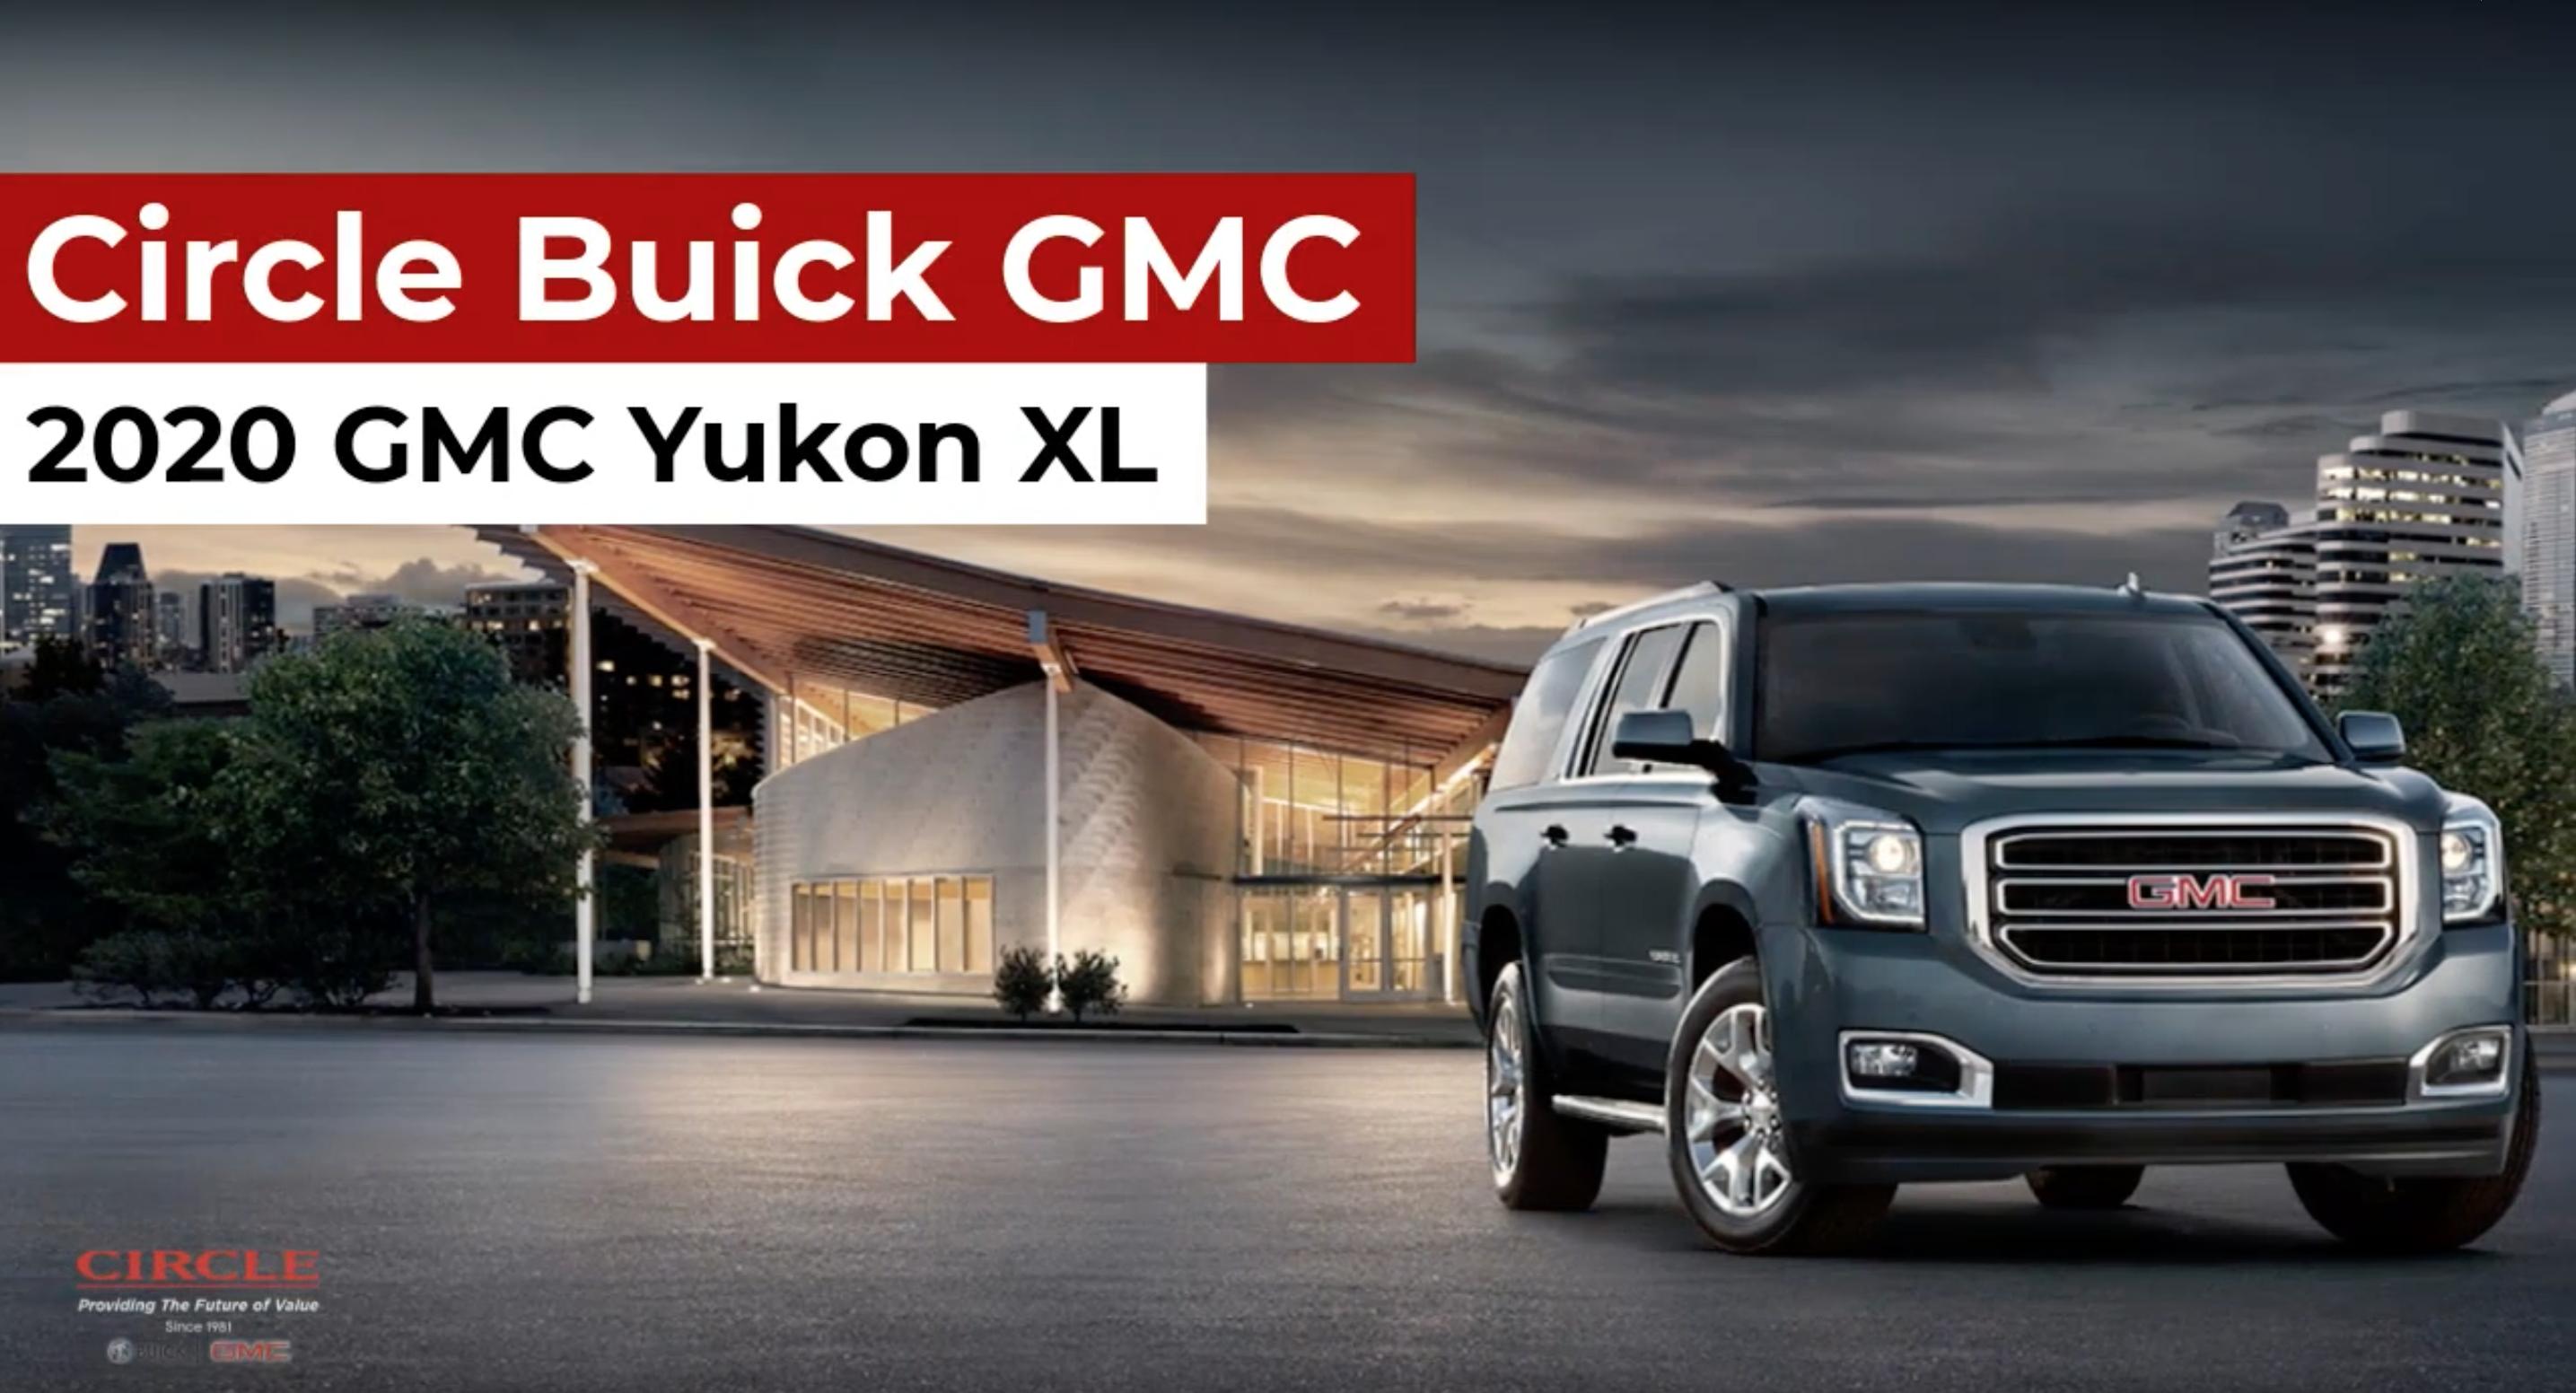 2020 Gmc Yukon Xl In 2020 Gmc Yukon Gmc Yukon Xl Buick Gmc